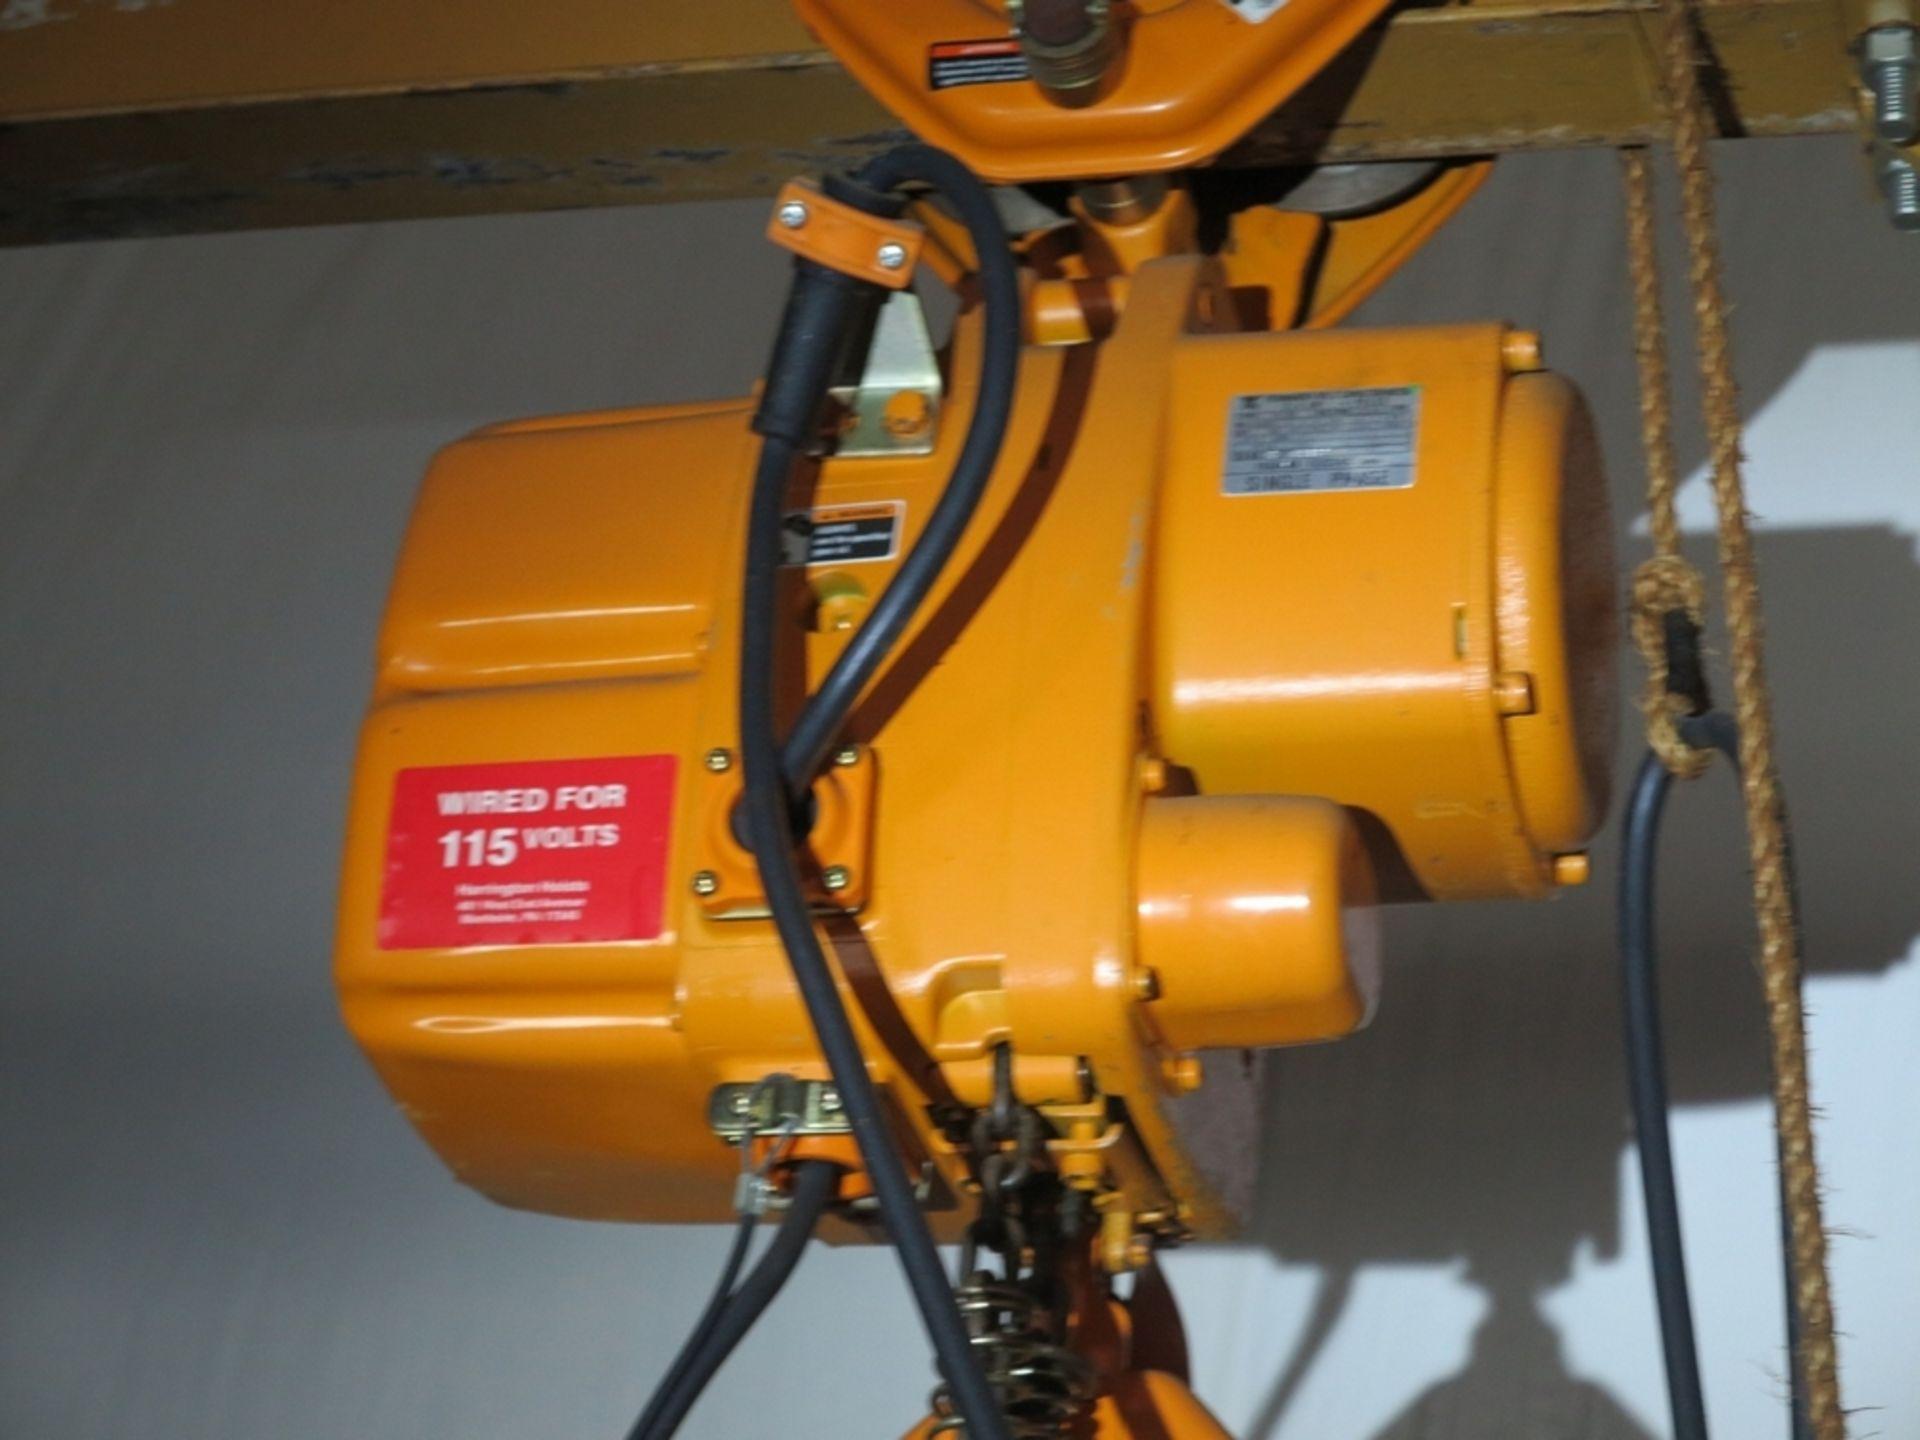 Lot 472 - SPANCO 1-TON GANTRY, 11' BETWEEN UPRIGHTS W/ HARRINGTON 1-TON ELECTRIC CHAIN HOIST W/ PENDANT